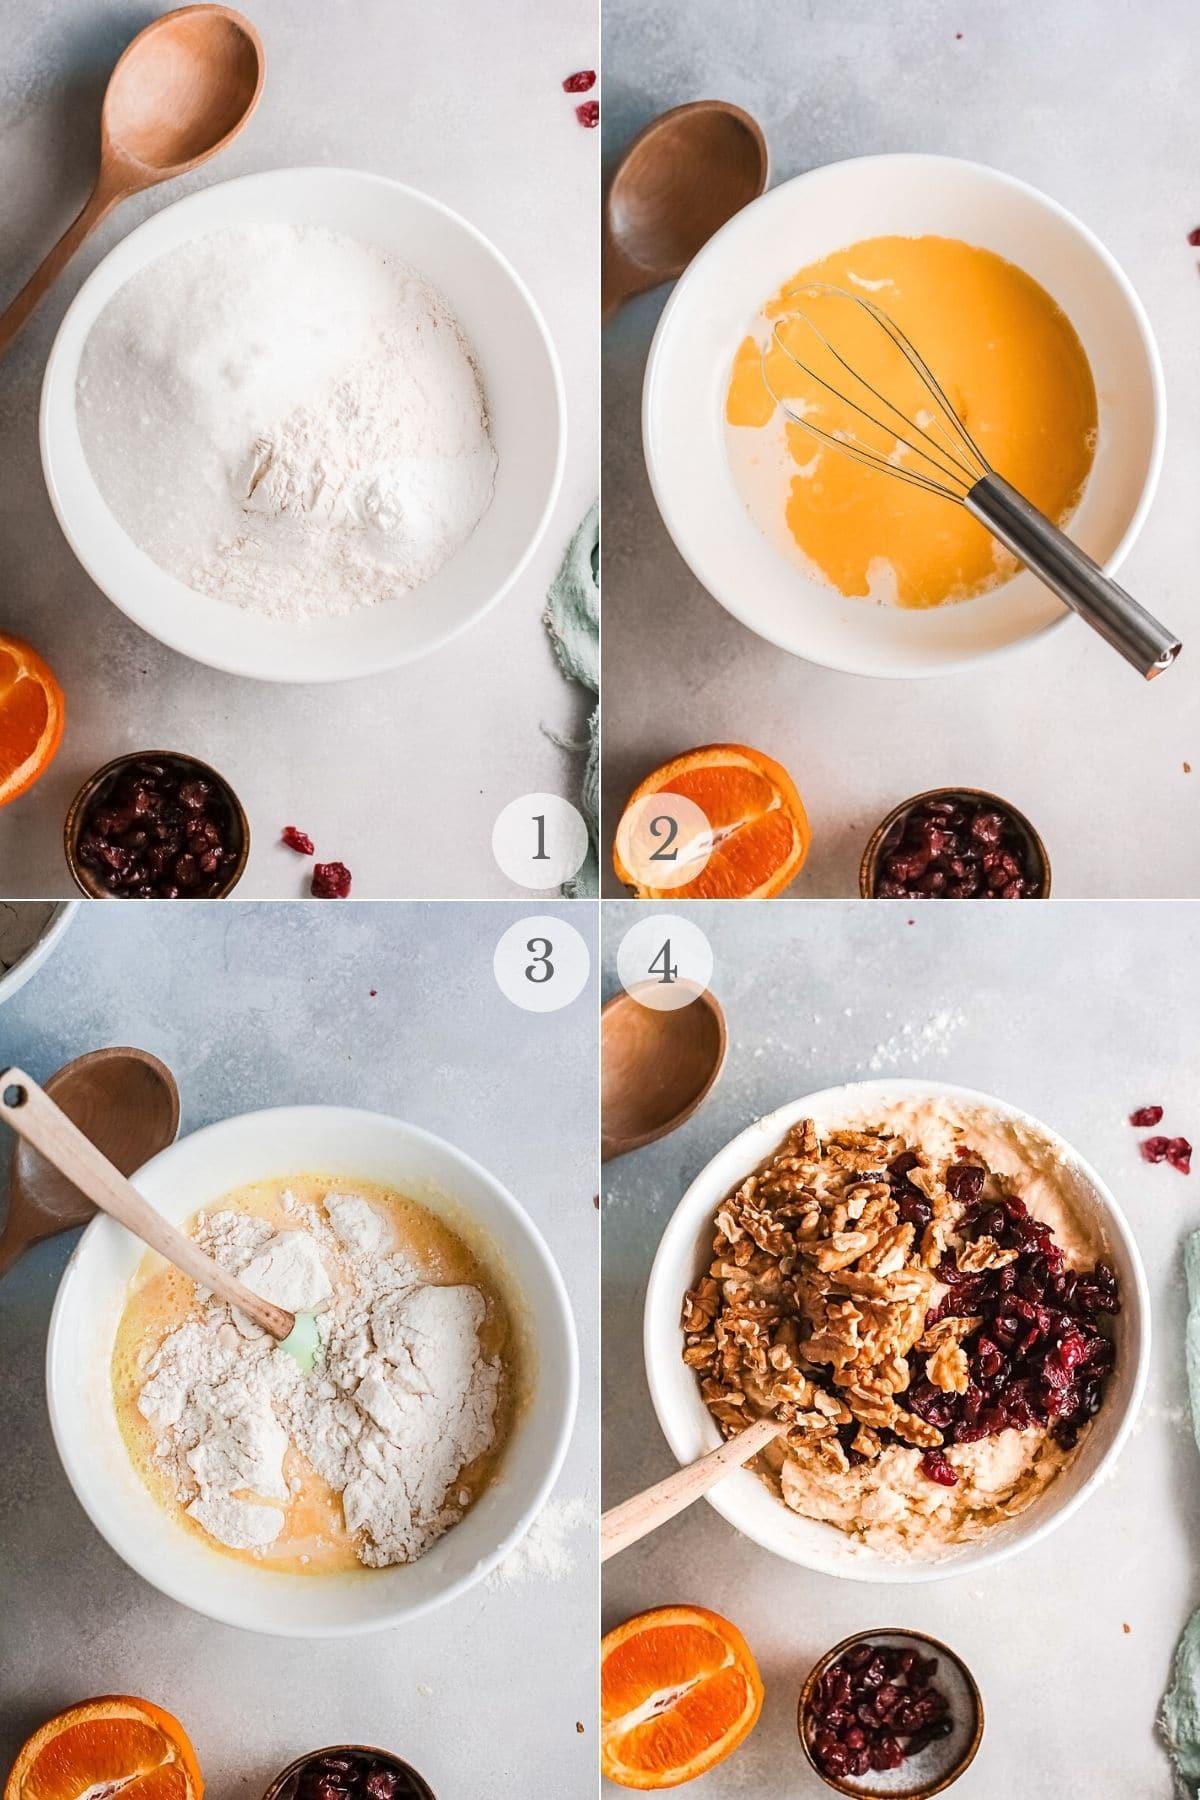 cranberry orange bread recipe steps 1-4